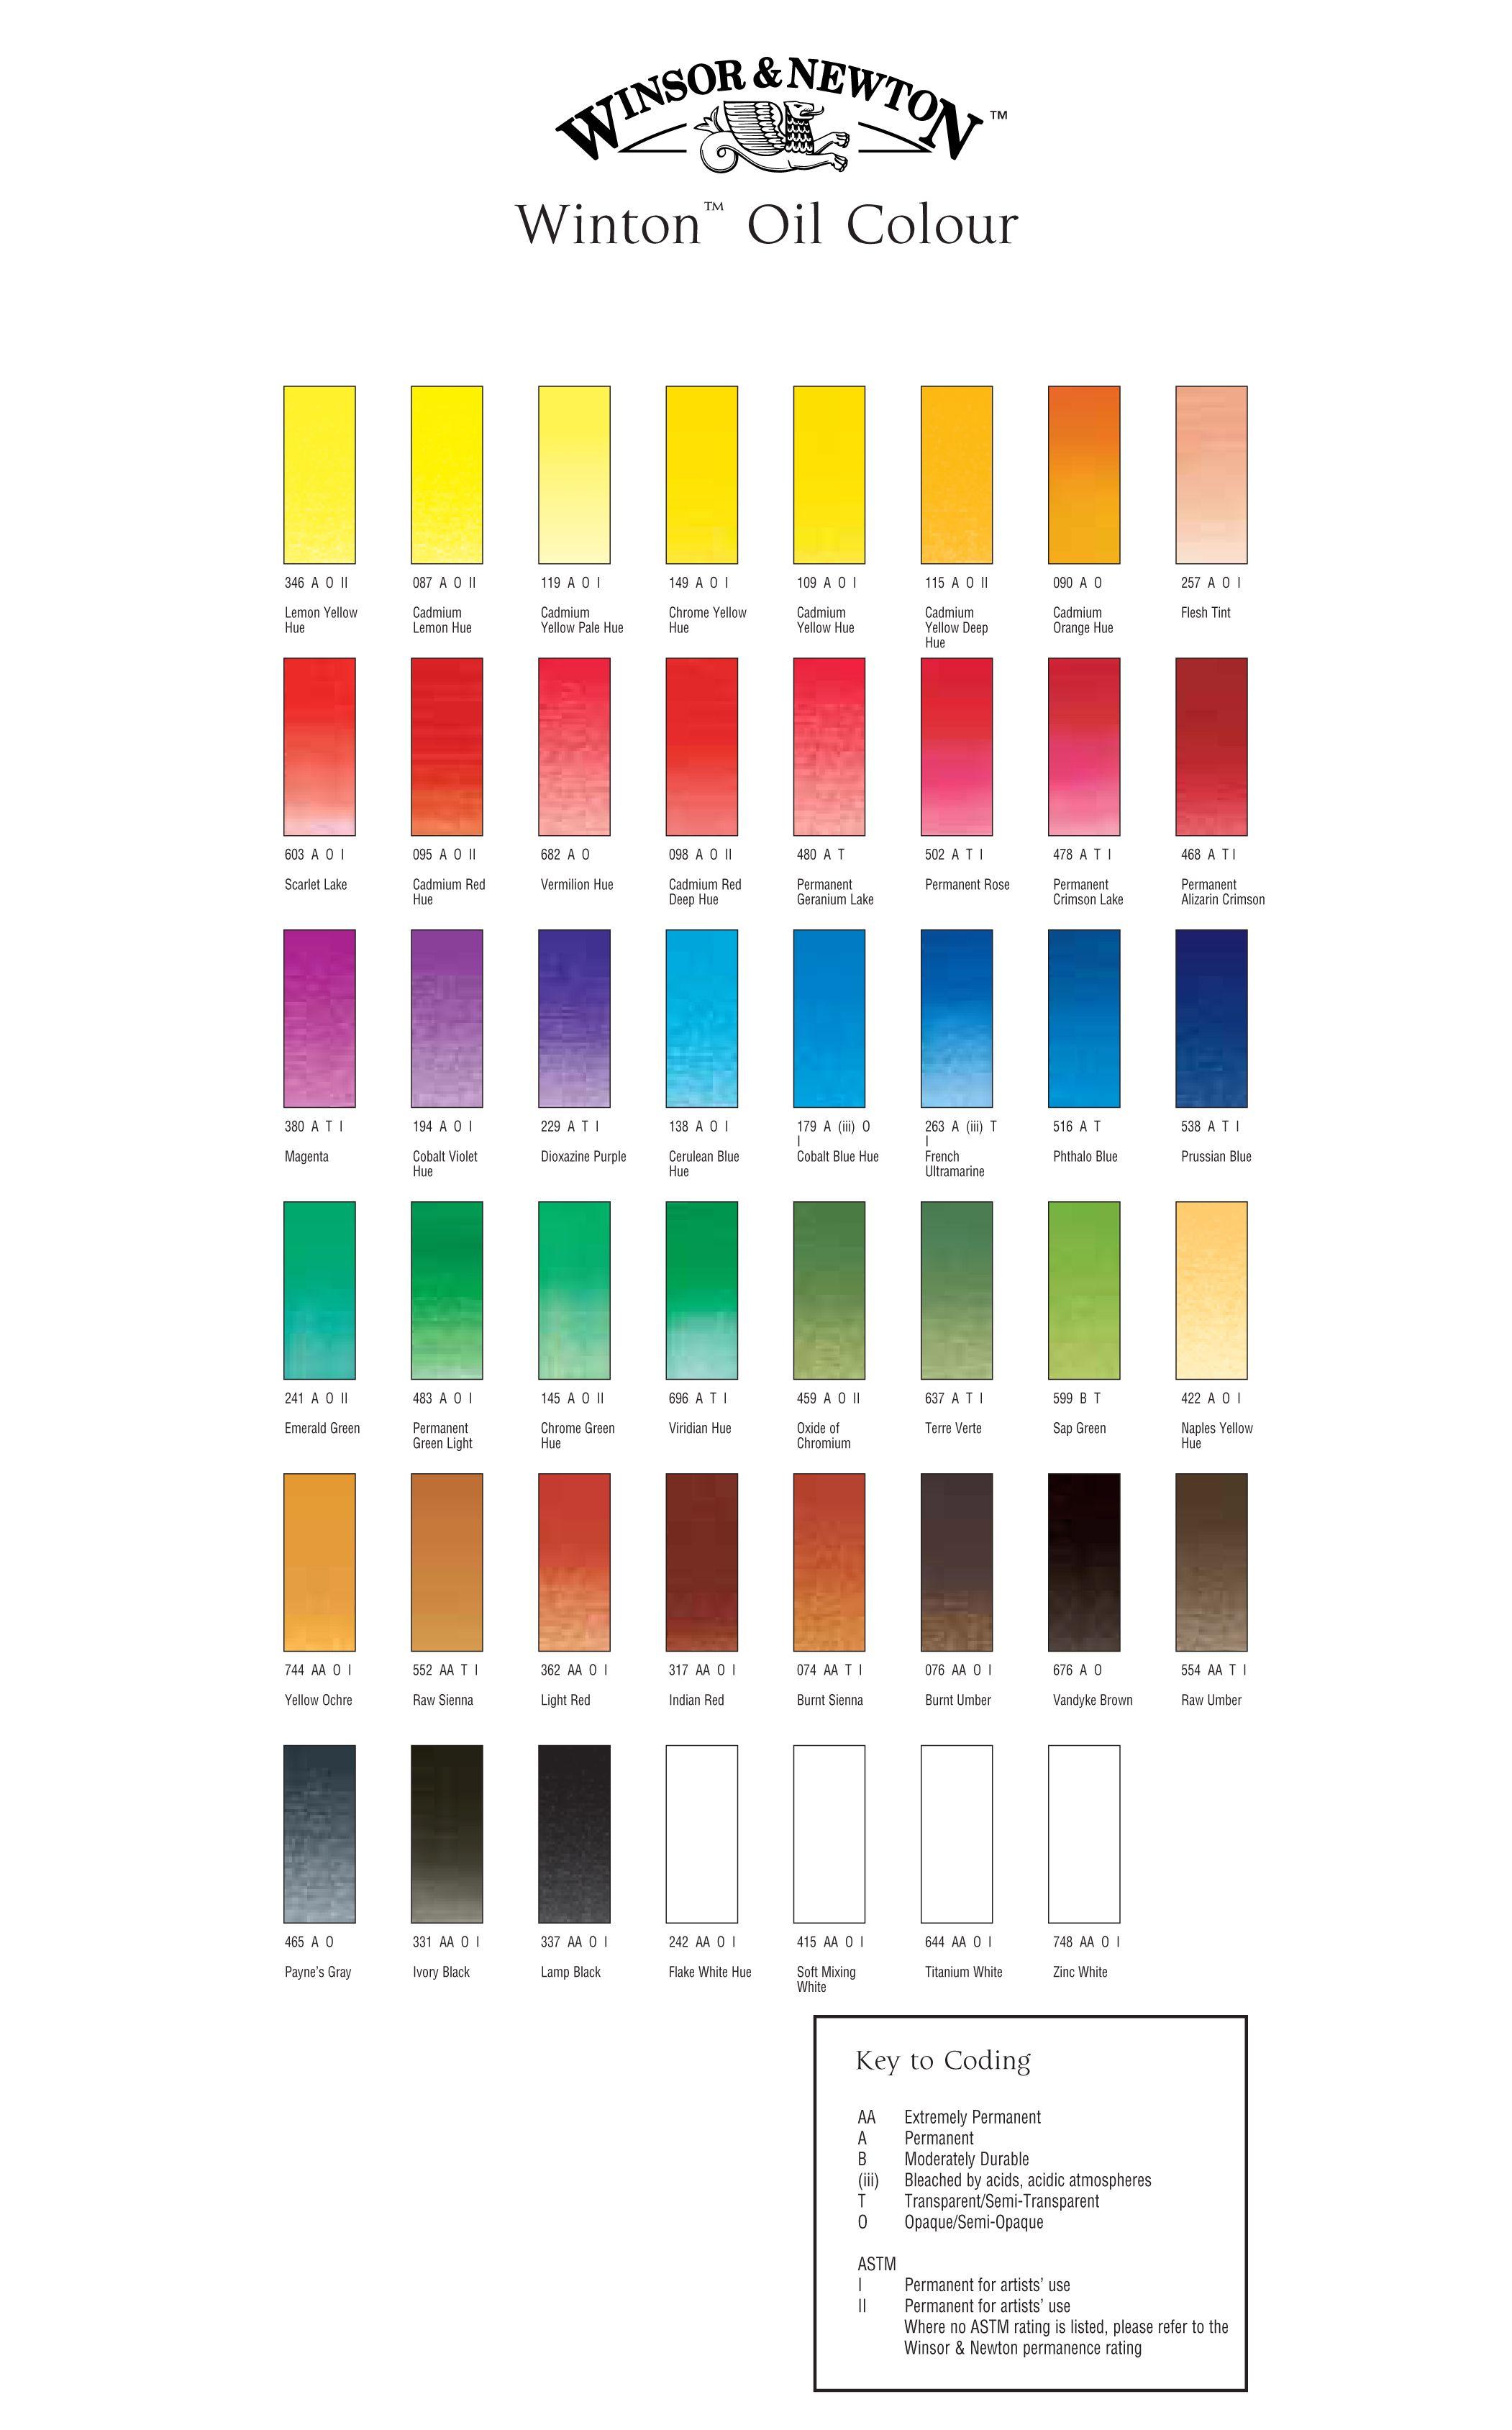 Winsor  newton winton oil paint colour chart  work in progress but having fun also rh pinterest